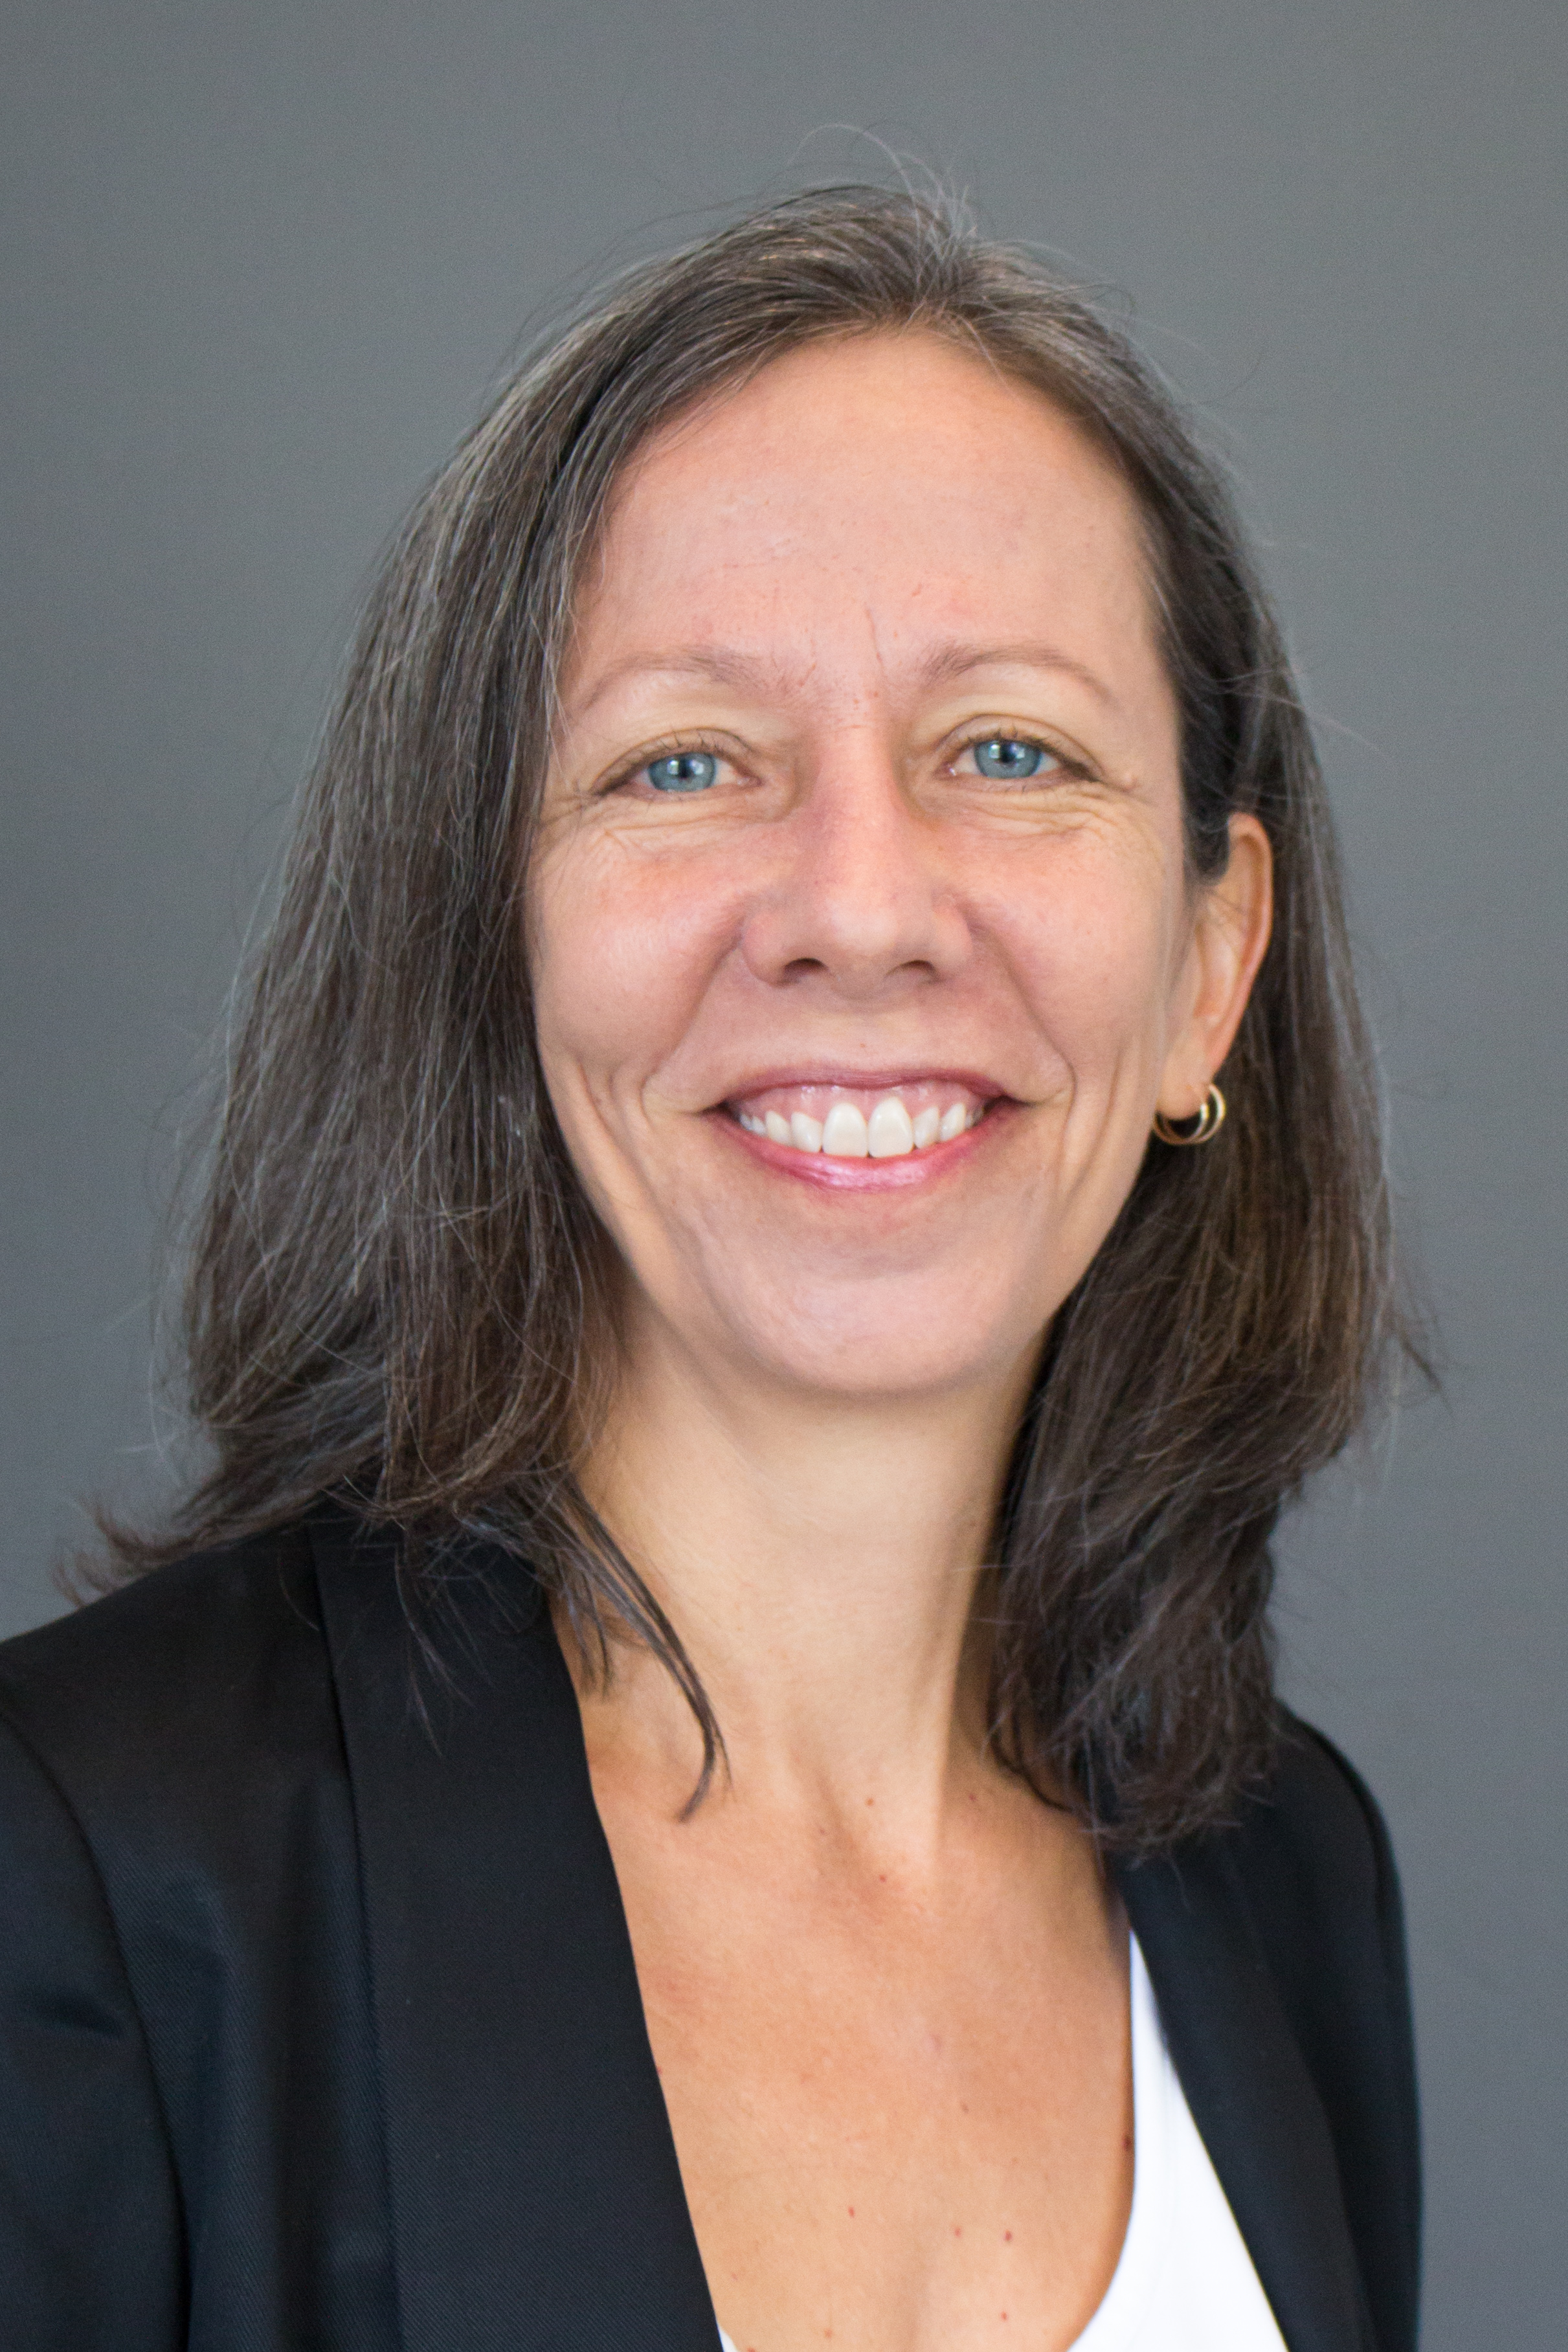 Headshot of Kathleen Duval